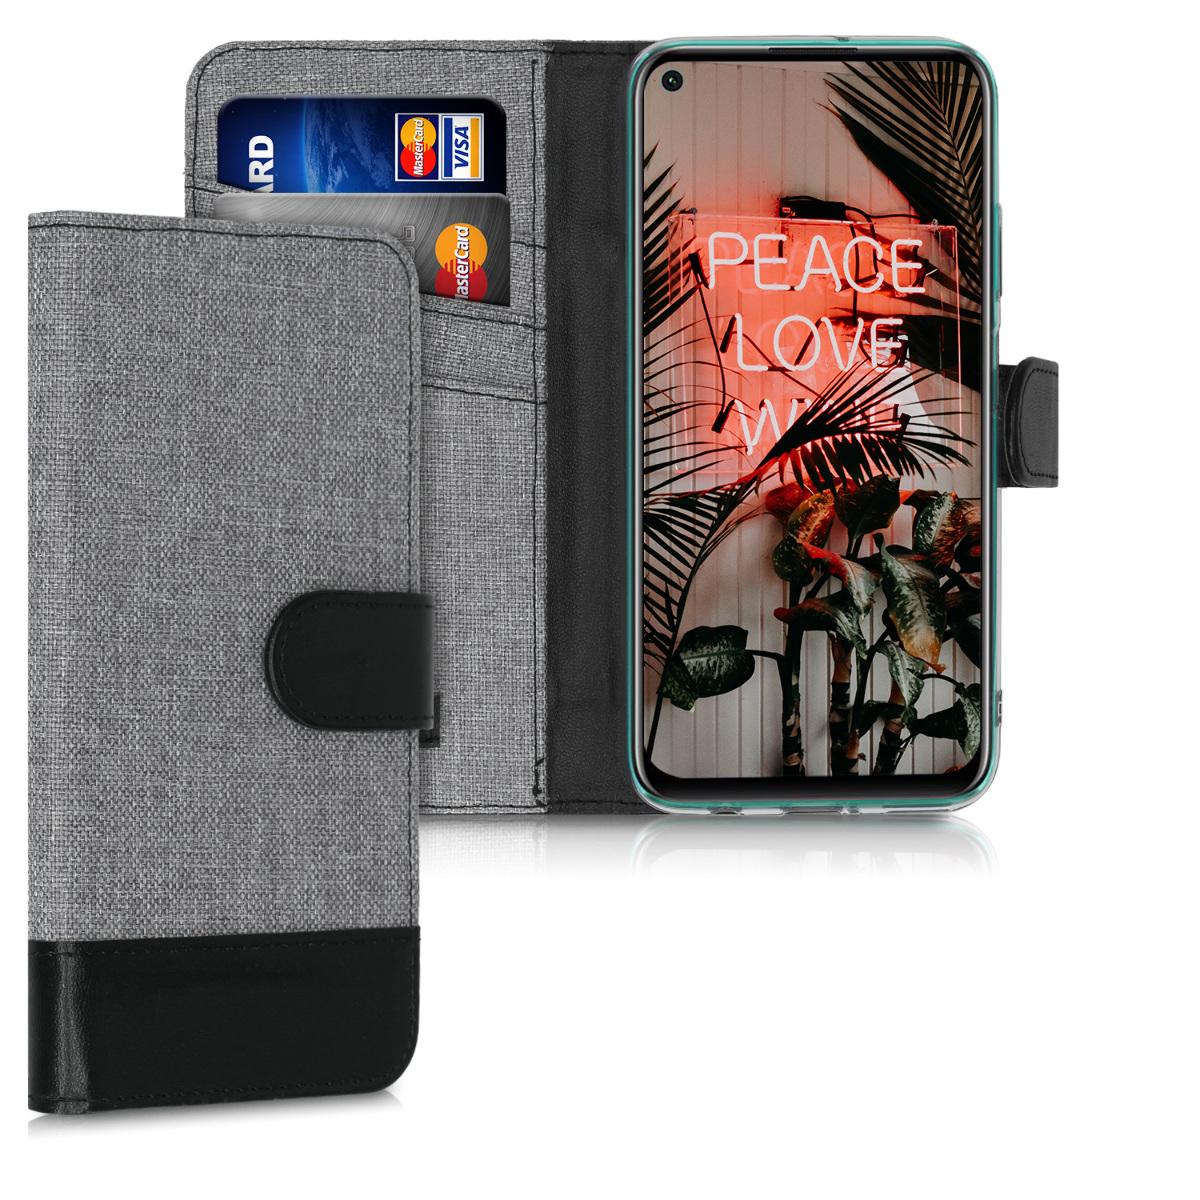 KW Θήκη Πορτοφόλι Huawei P40 Lite - Grey / Black (51497.22)